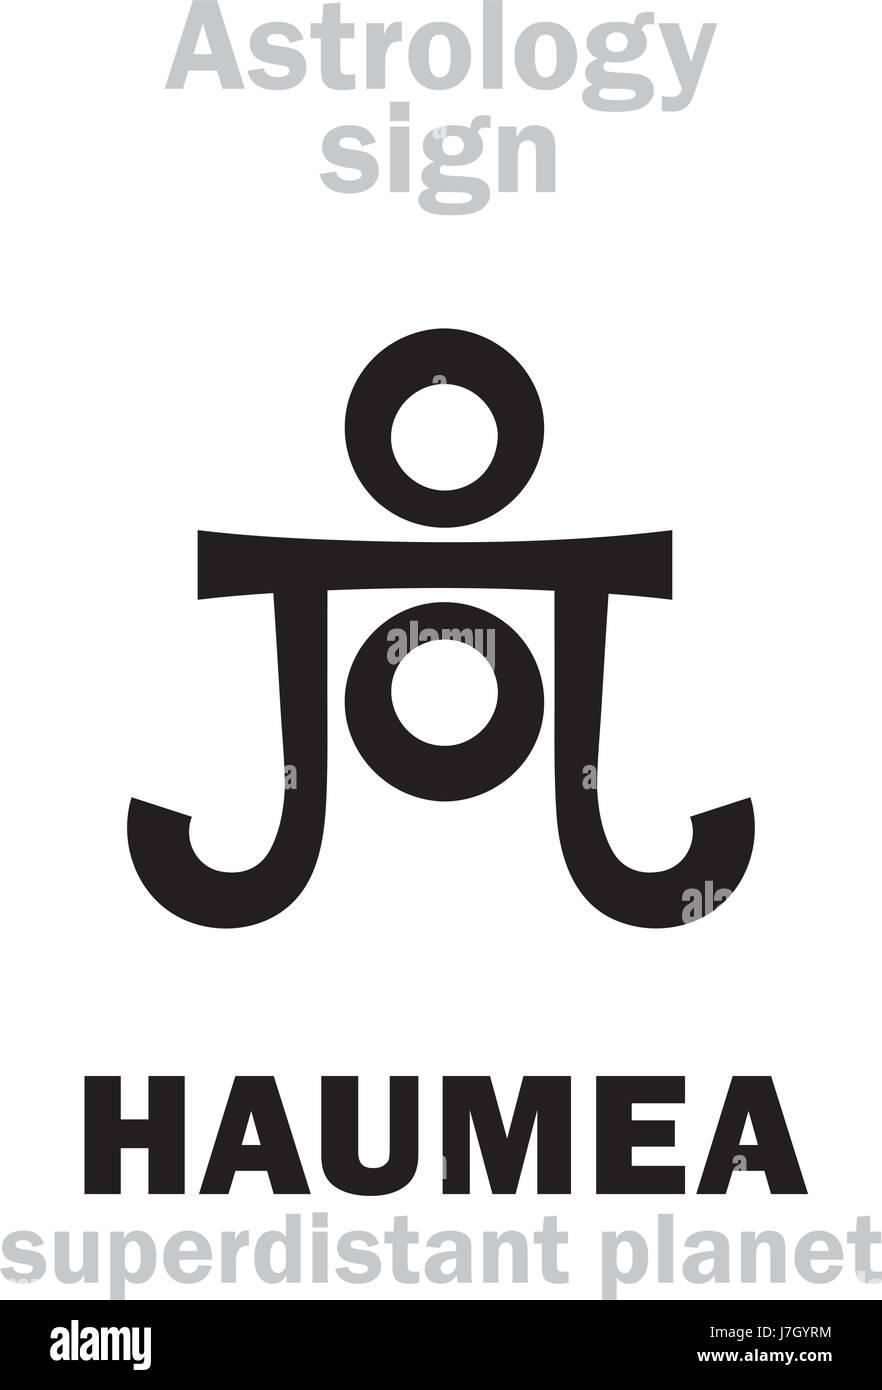 Astrology Alphabet: HAUMEA, superdistant dwarf planet. Hieroglyphics character sign (single symbol). Stock Vector